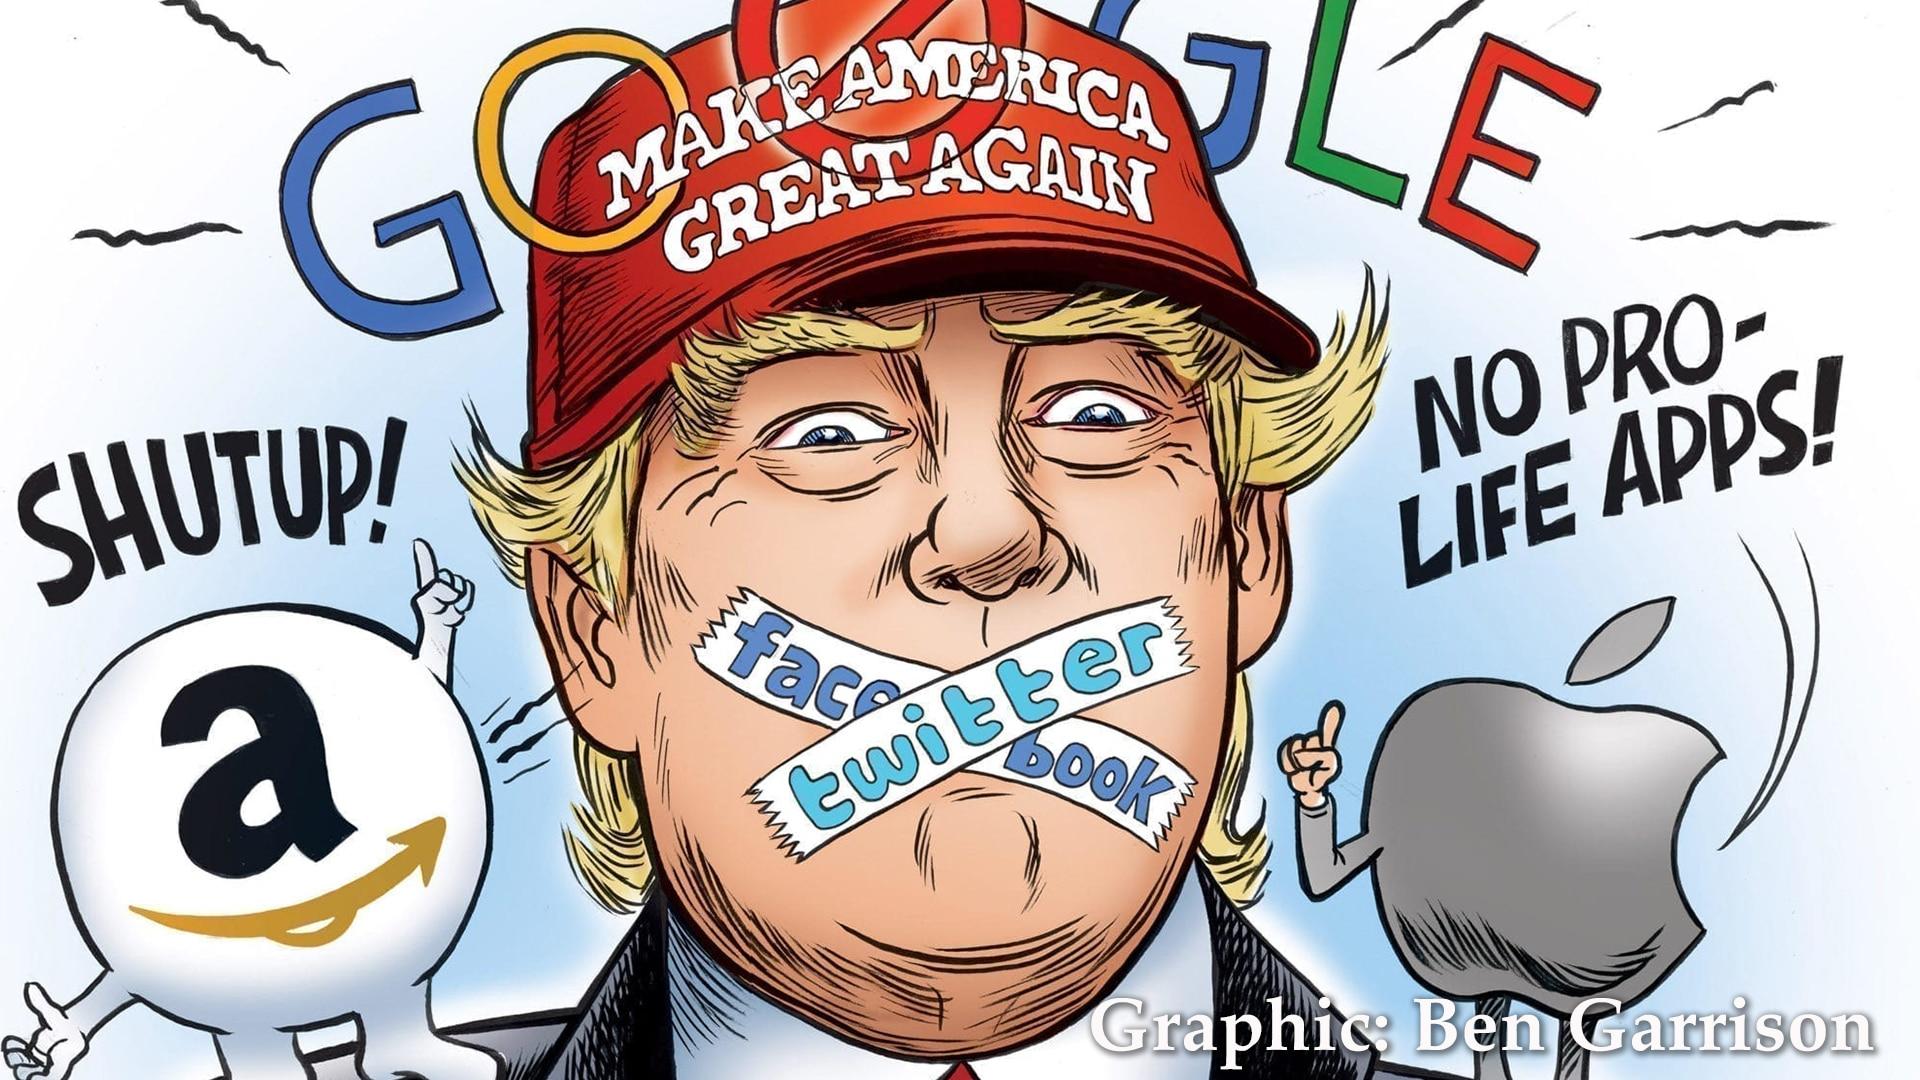 Purged Trump